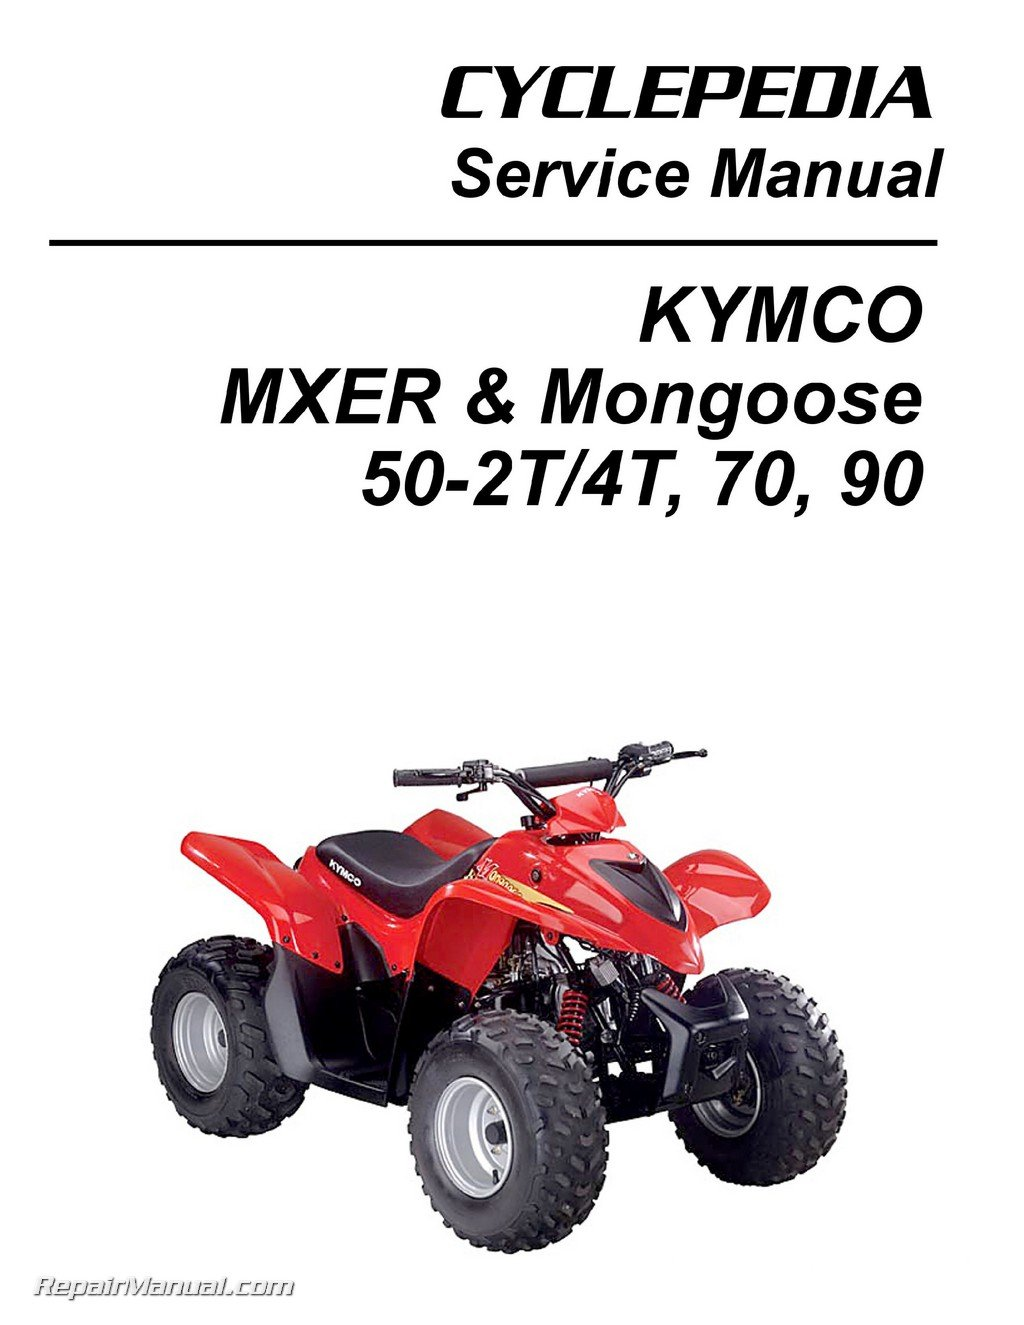 CPP-215-P KYMCO MXER & Mongoose 50-2T, 50-4T, 70 & 90cc ATV Printed Service  Manual: Manufacturer: Amazon.com: Books